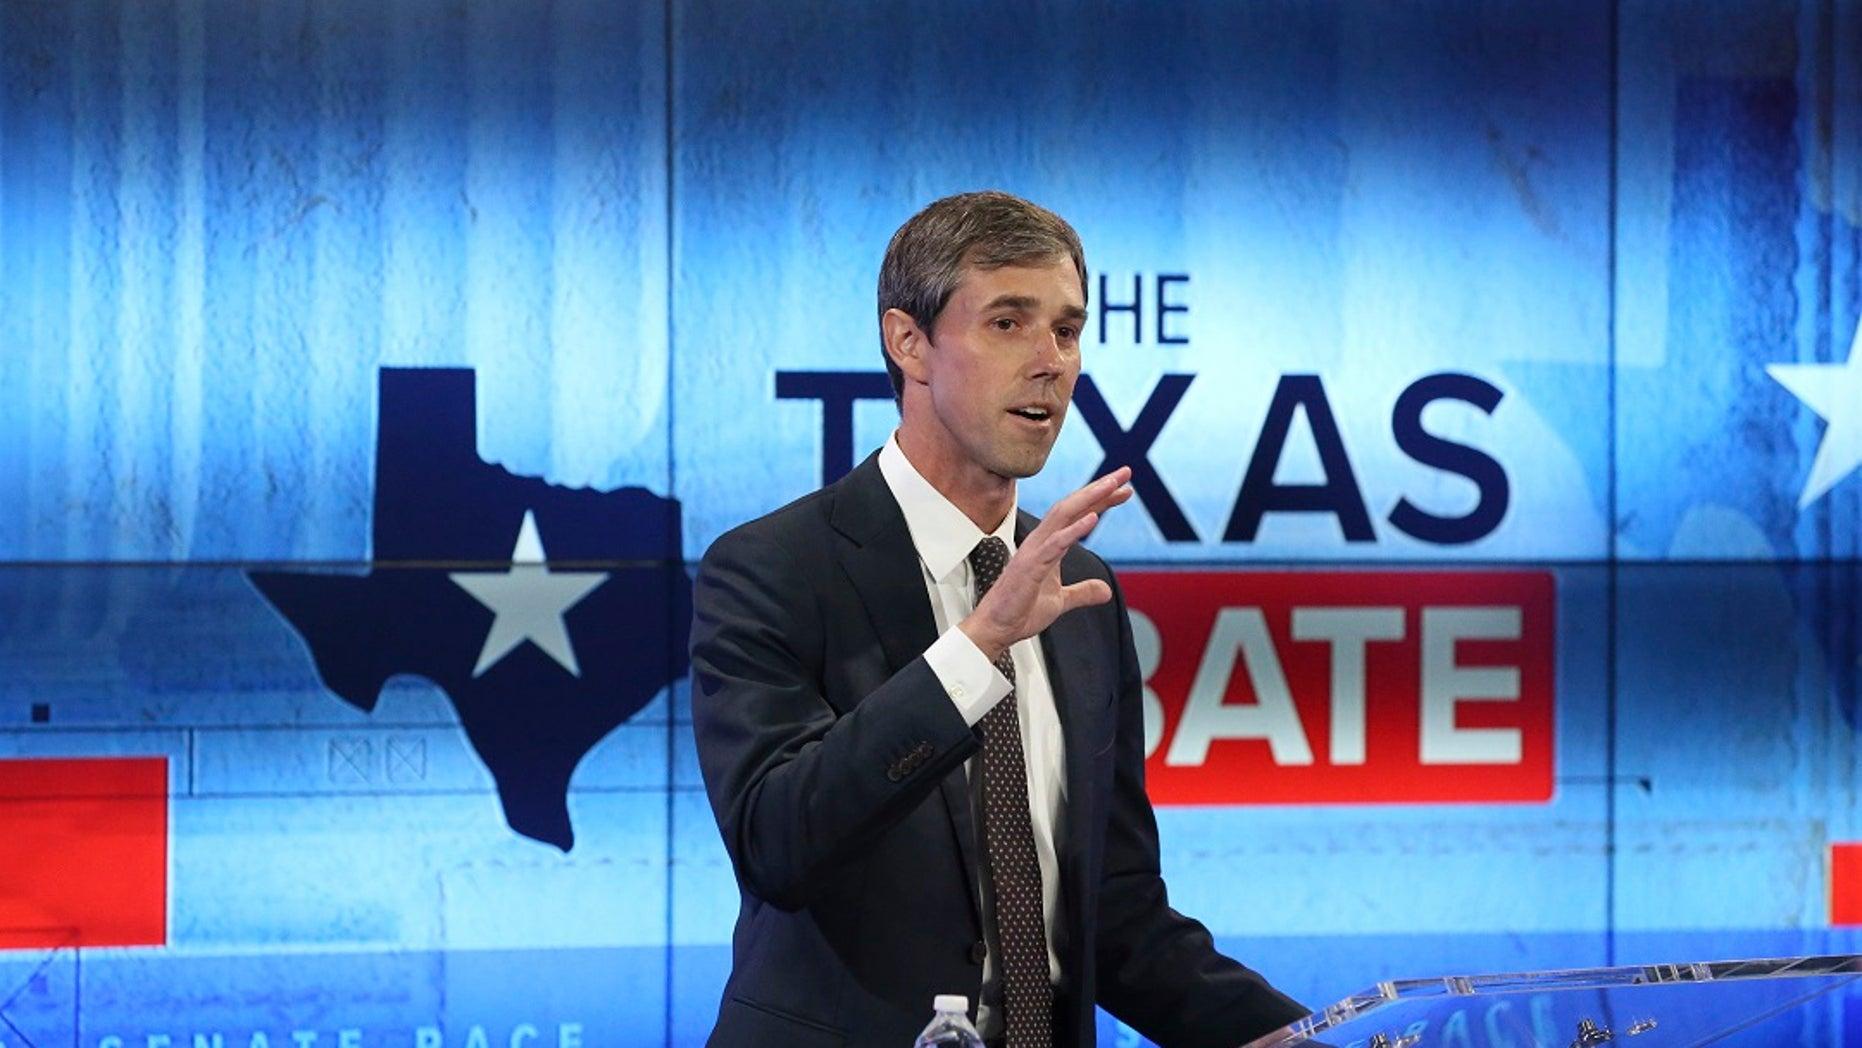 U.S. Rep. Beto O'Rourke, D-Texas, pictured, takes part in a debate for a U.S. Senate seat against incumbent U.S. Sen. Ted Cruz, R-Texas.